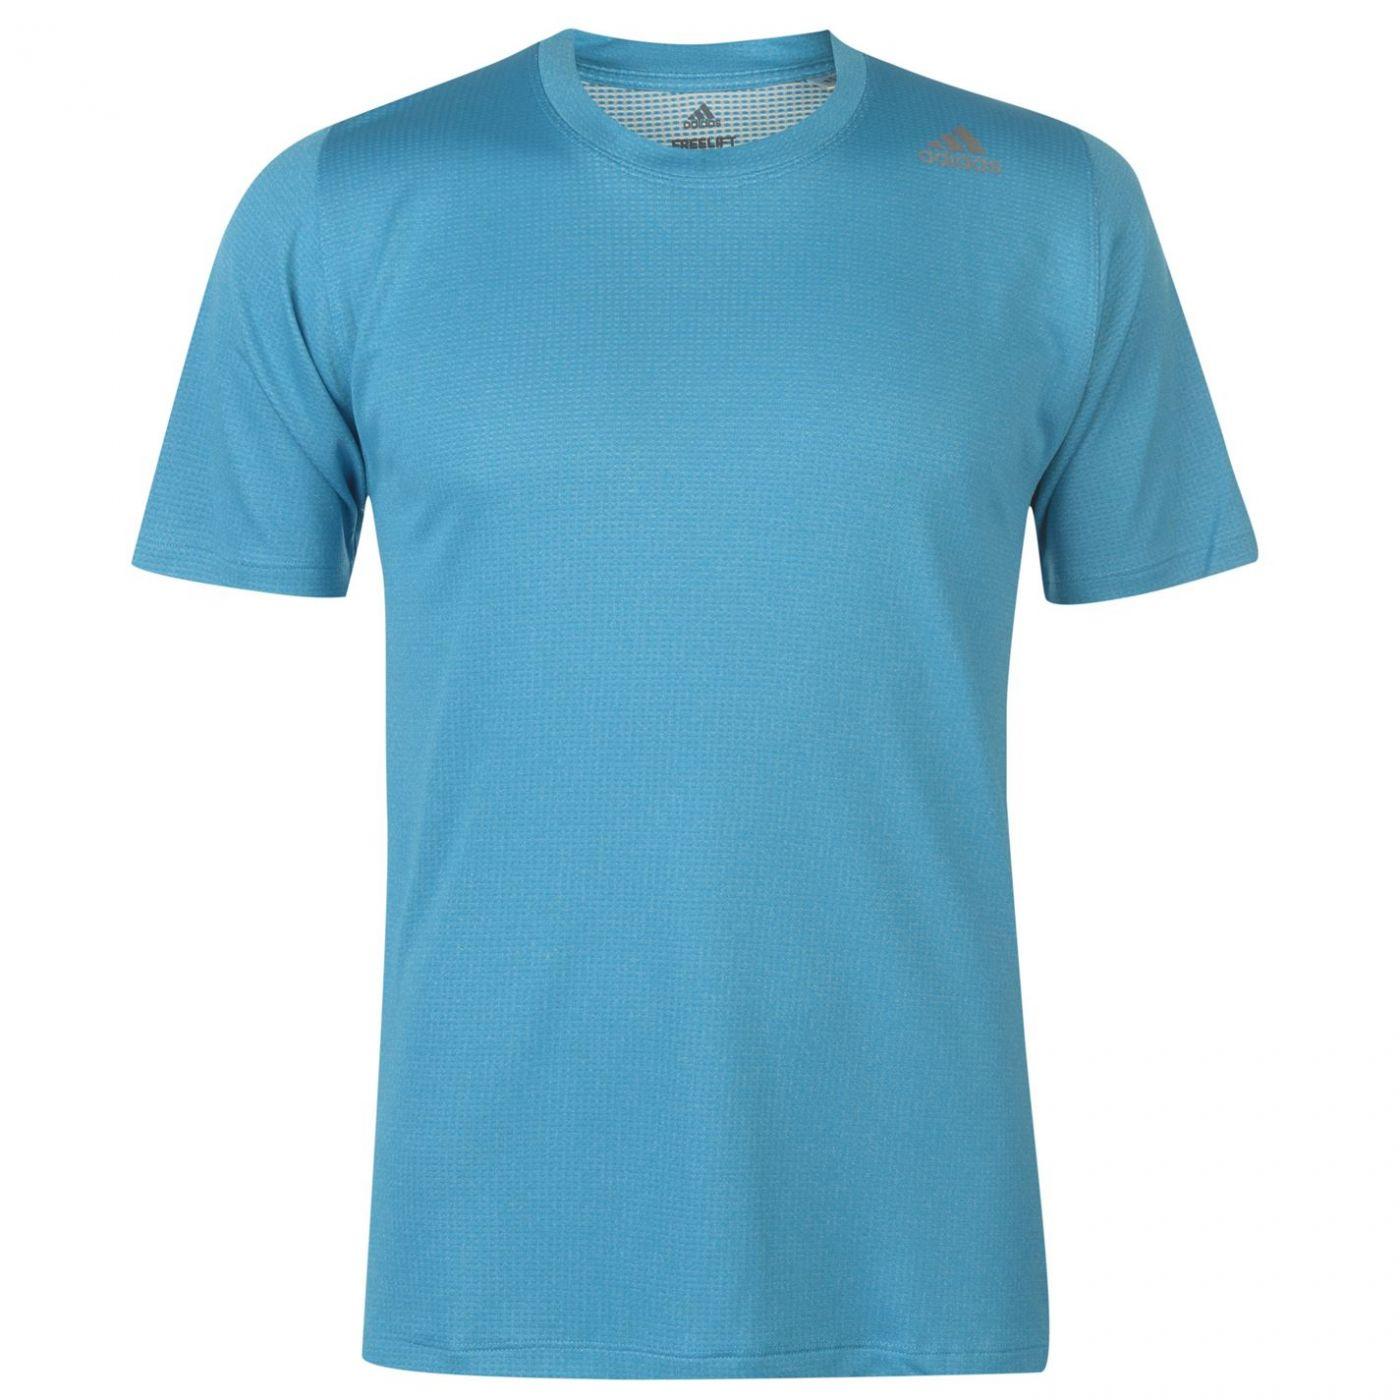 Adidas Climachill T Shirt Mens